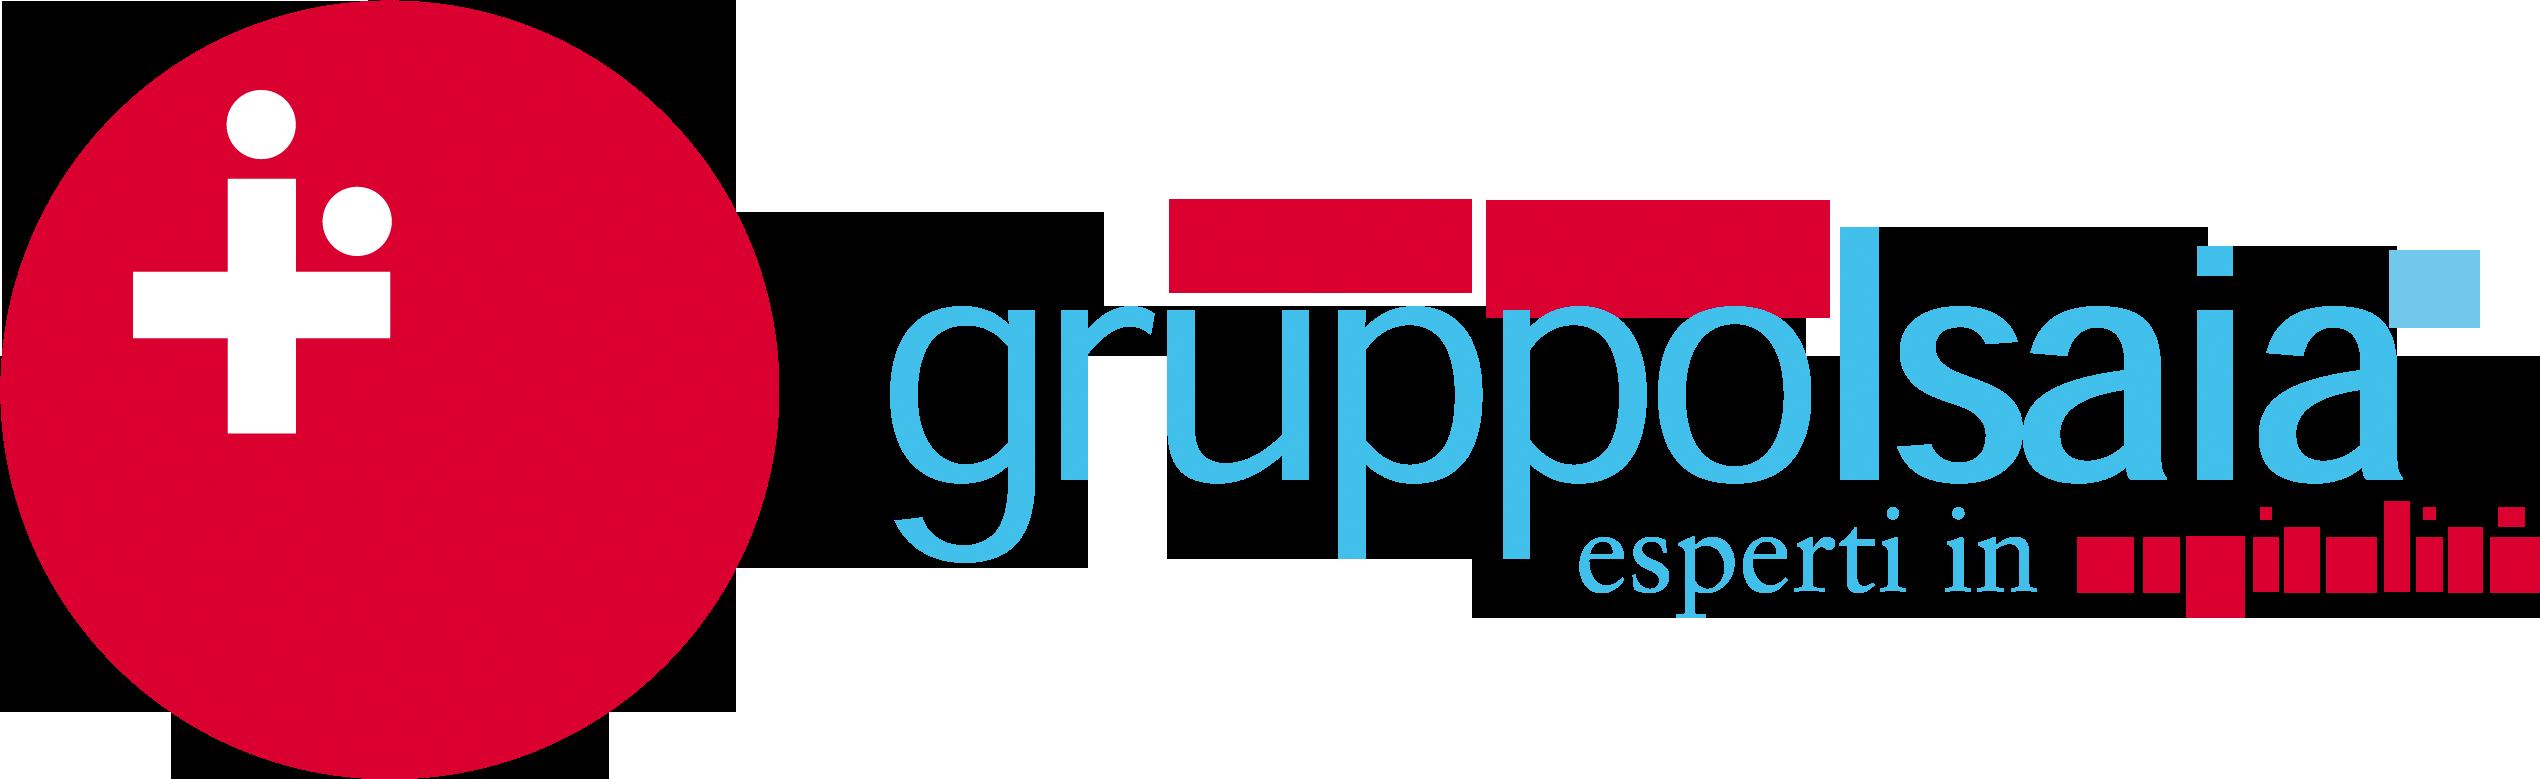 Franquicia grupo isaia